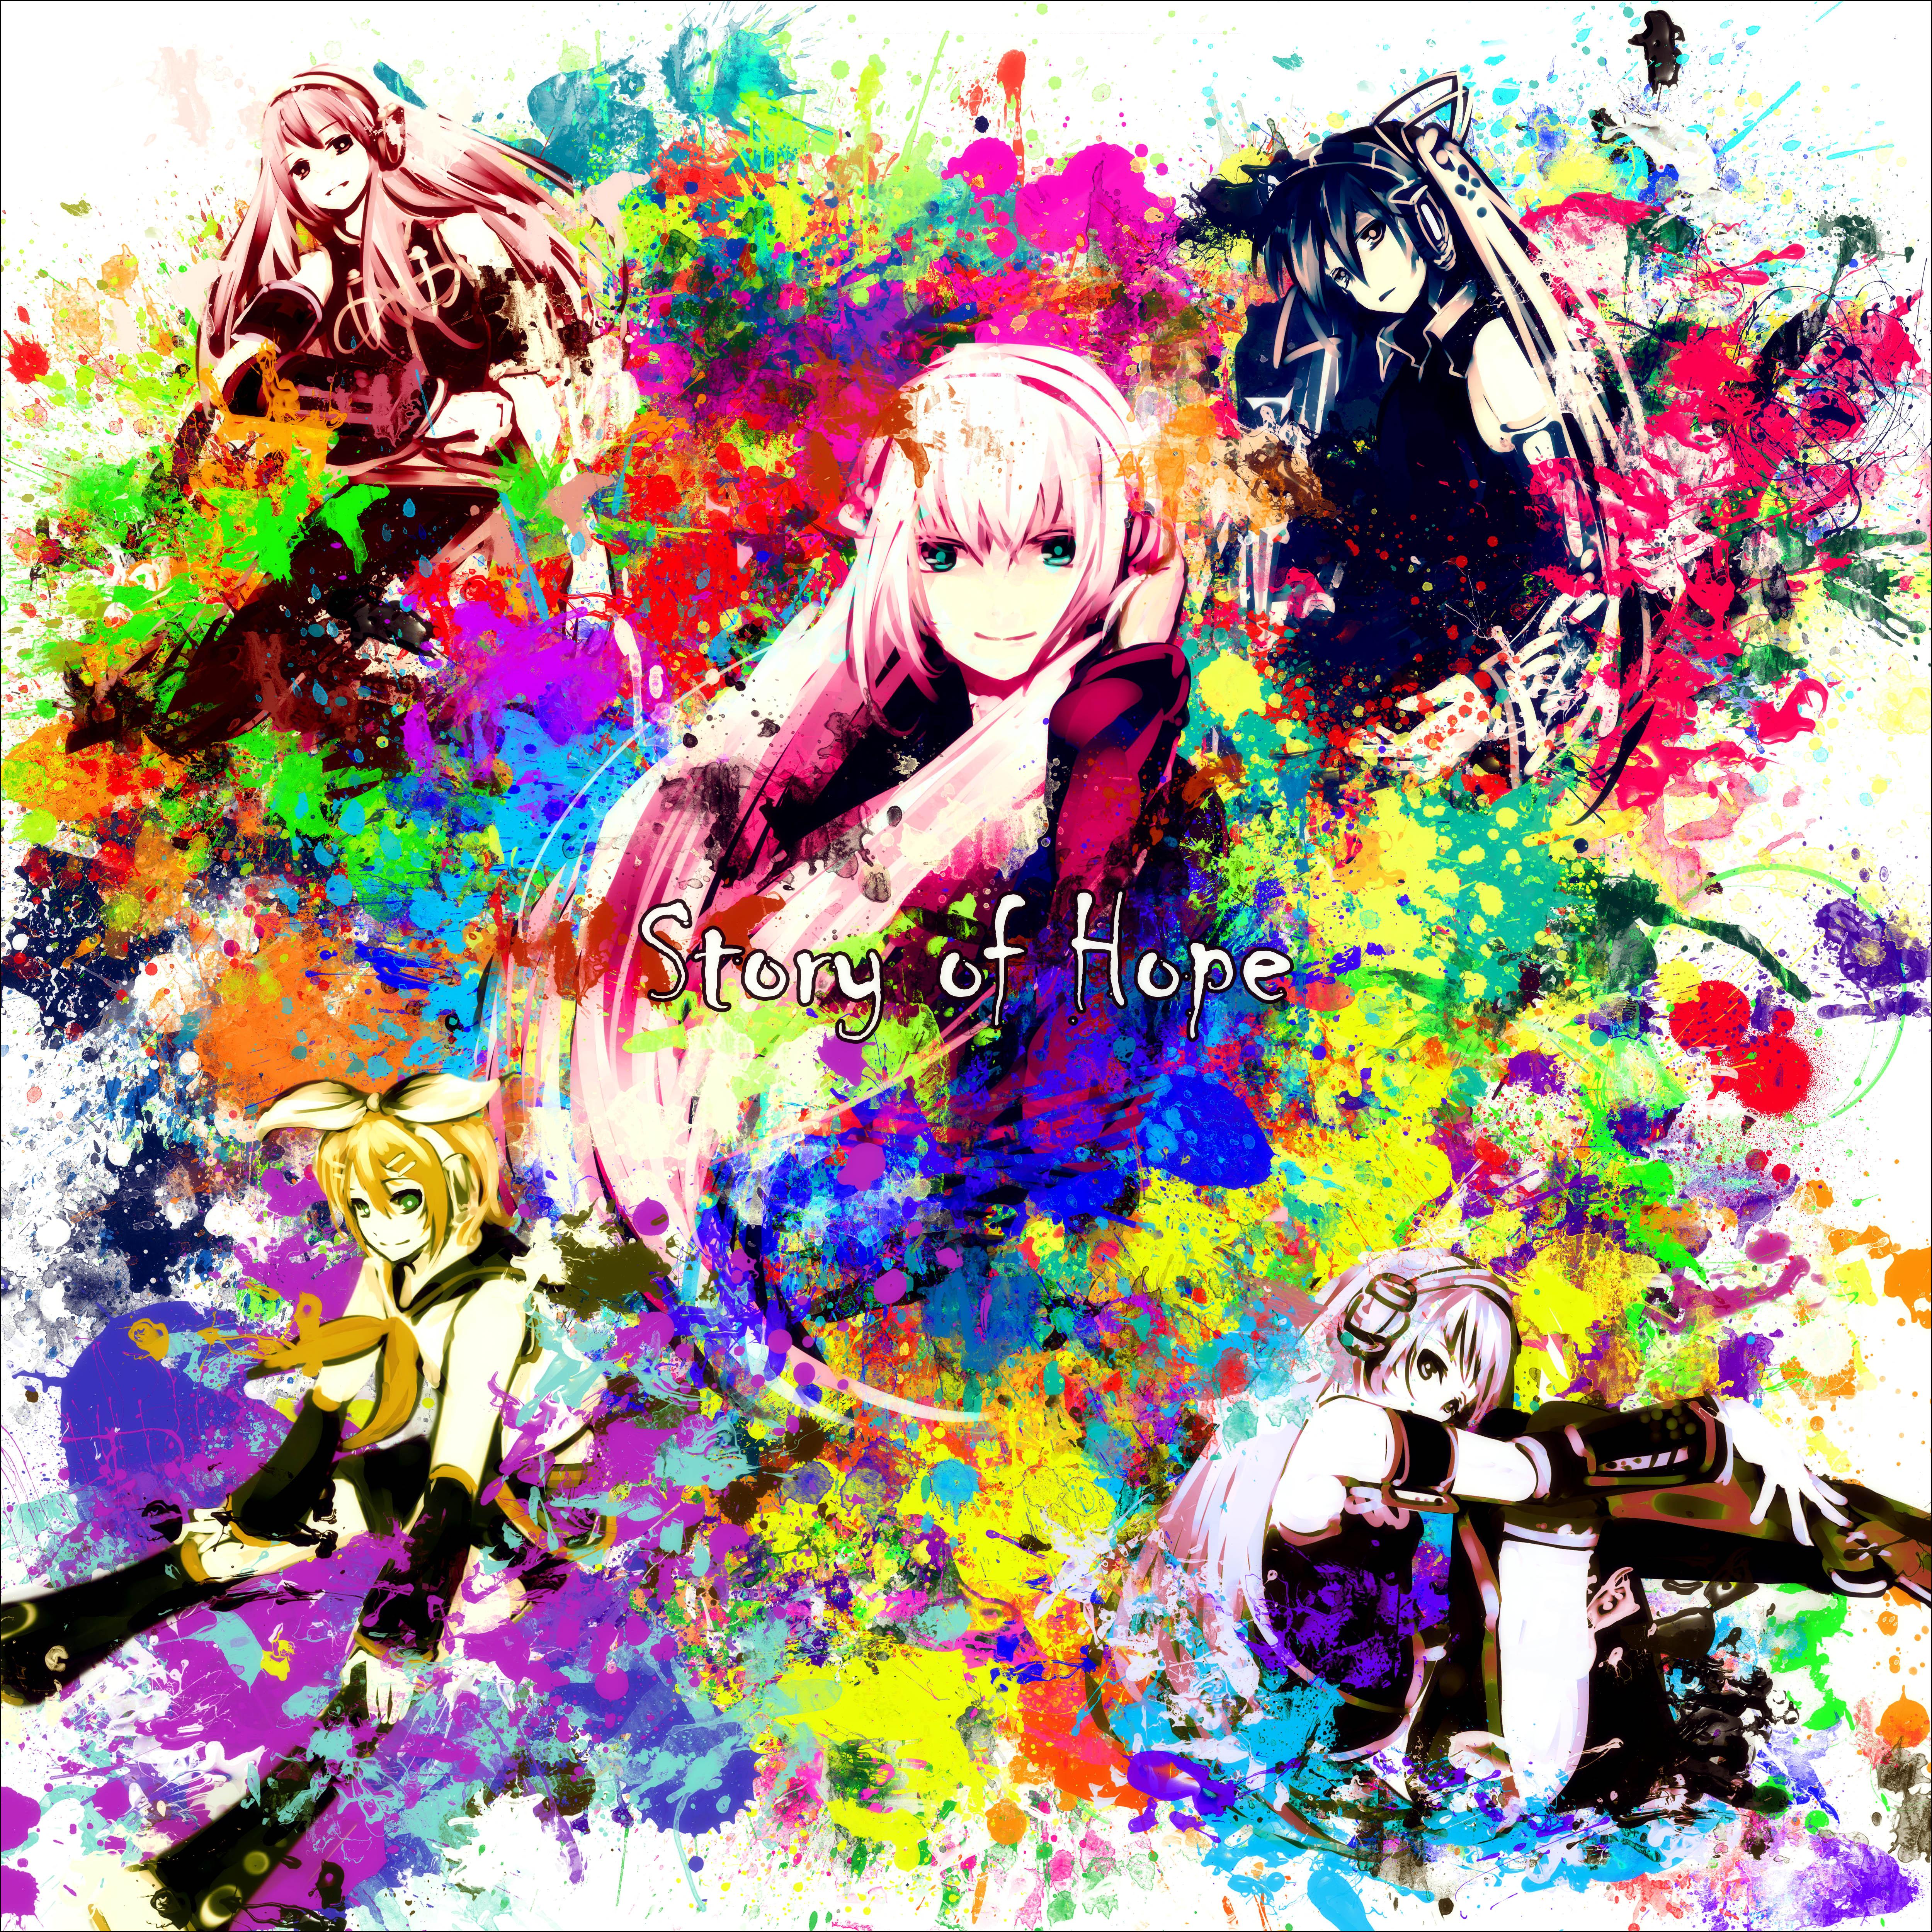 Story of Hope/Yuyoyuppe